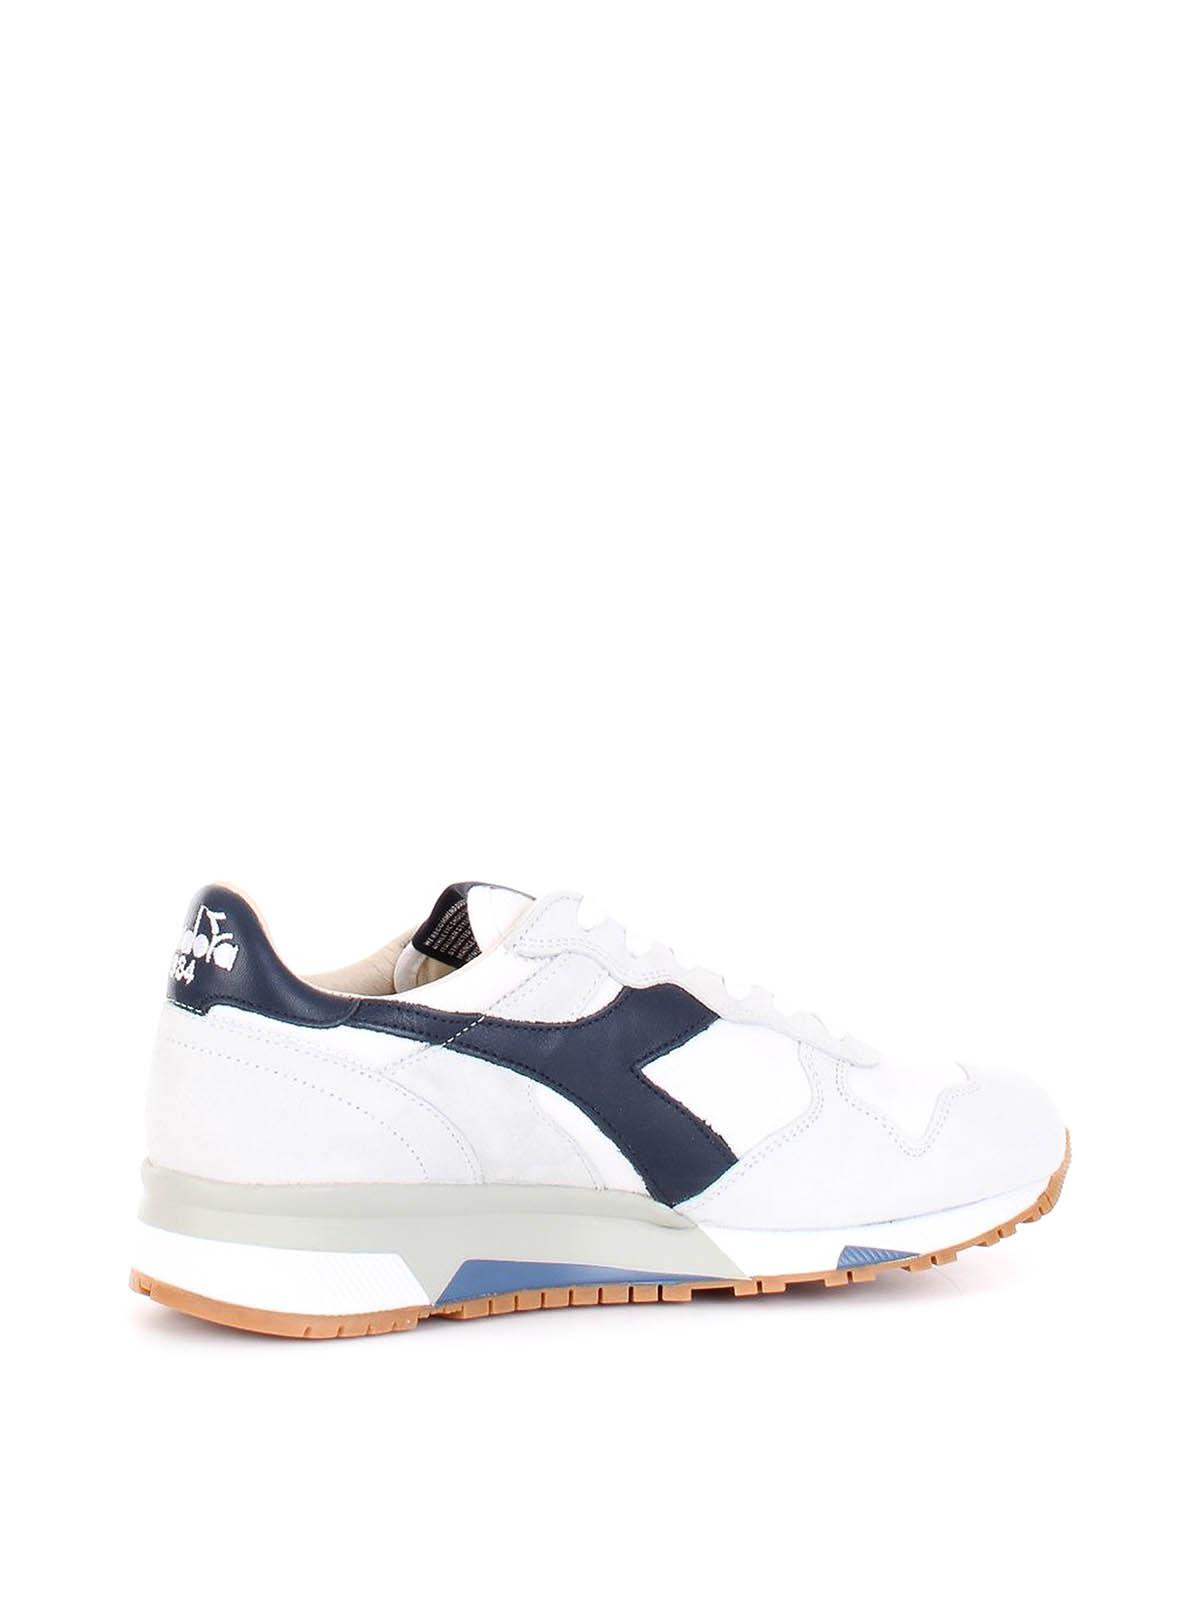 Diadora Heritage Sneakers Trident 90 C SW sneakers